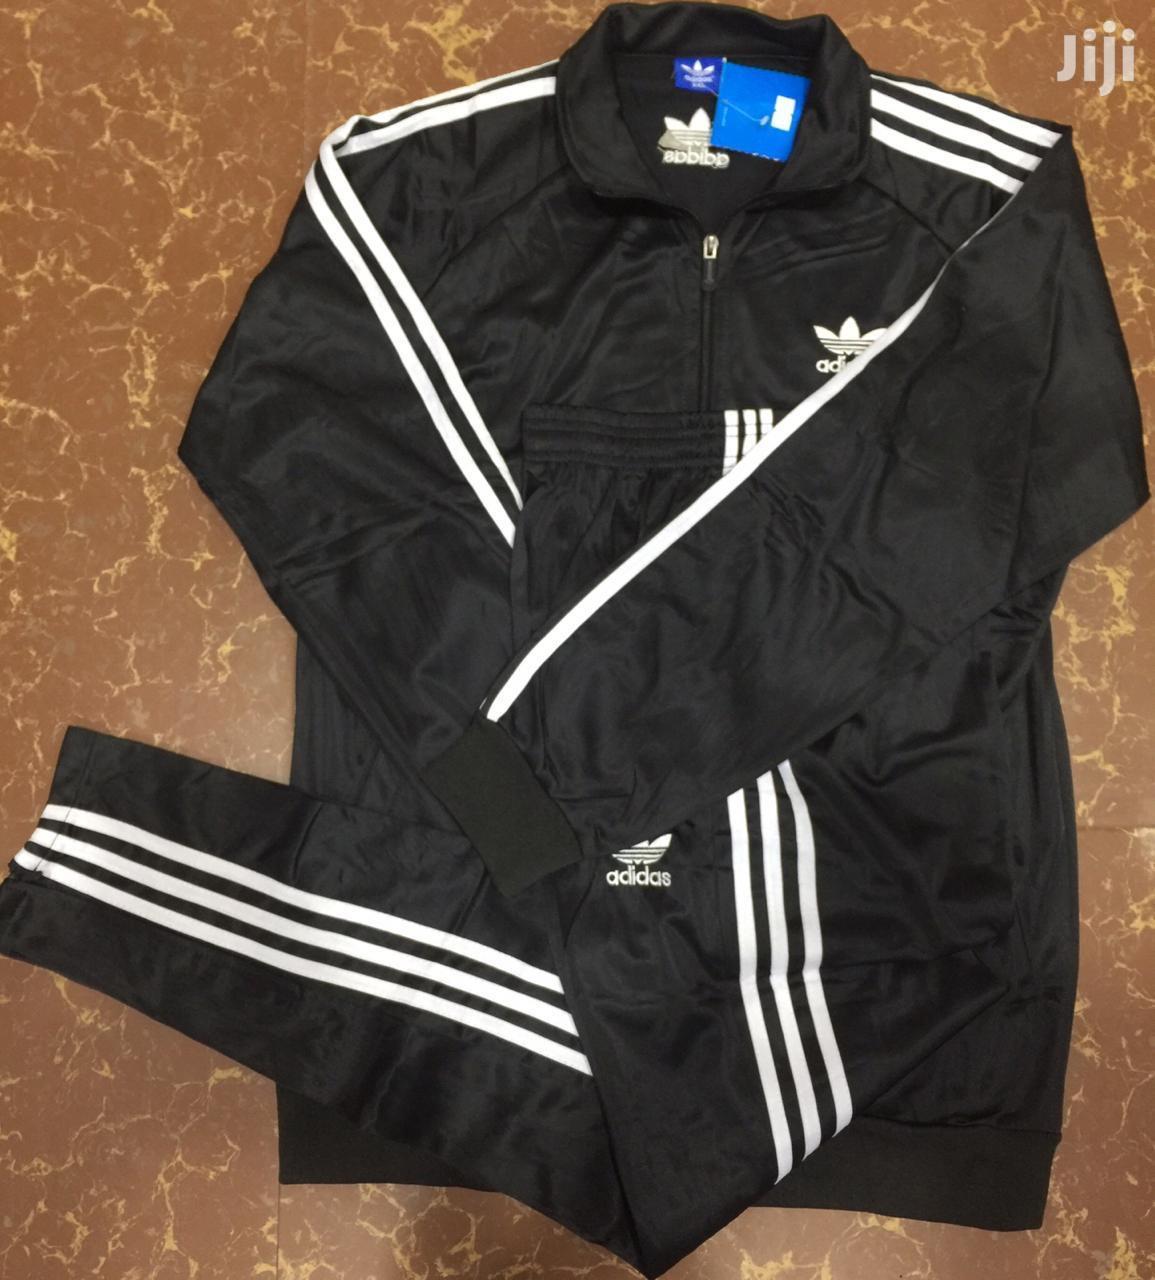 Black Adidas Tracksuit | Clothing for sale in Nairobi Central, Nairobi, Kenya